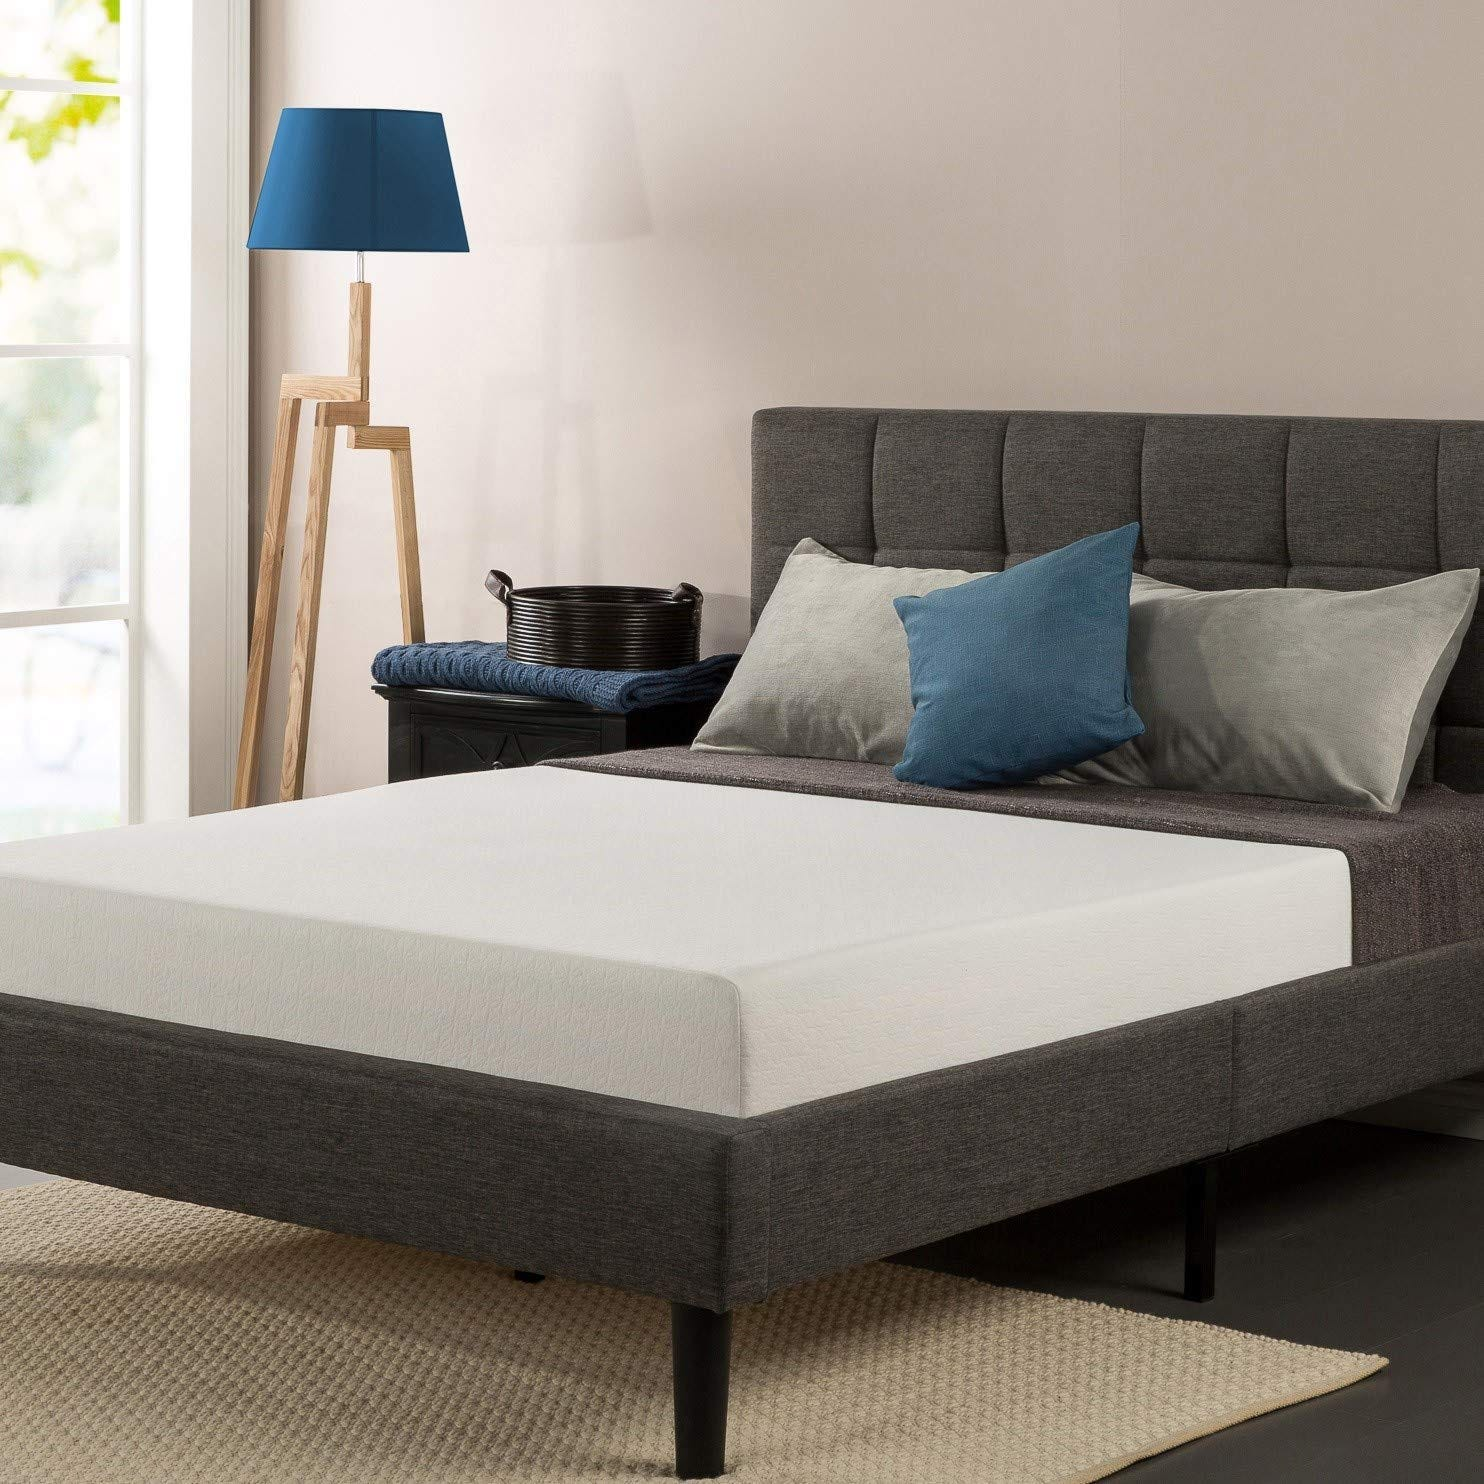 zinus, ultima, mattress, foam mattress, cheap, inexpensive